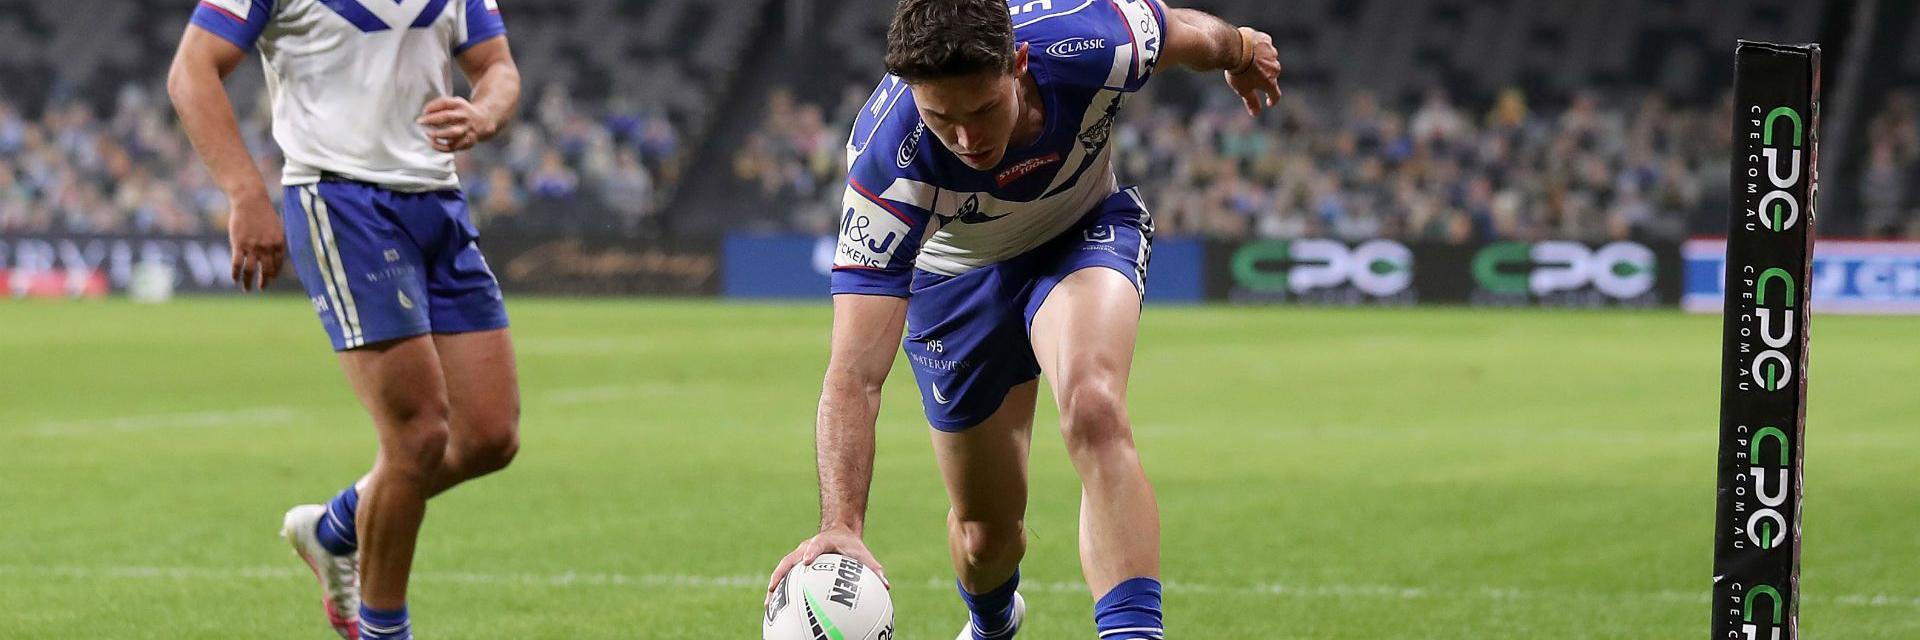 NRL Odds & Picks - Telstra Premiership Roosters Vs Bulldogs Round 5